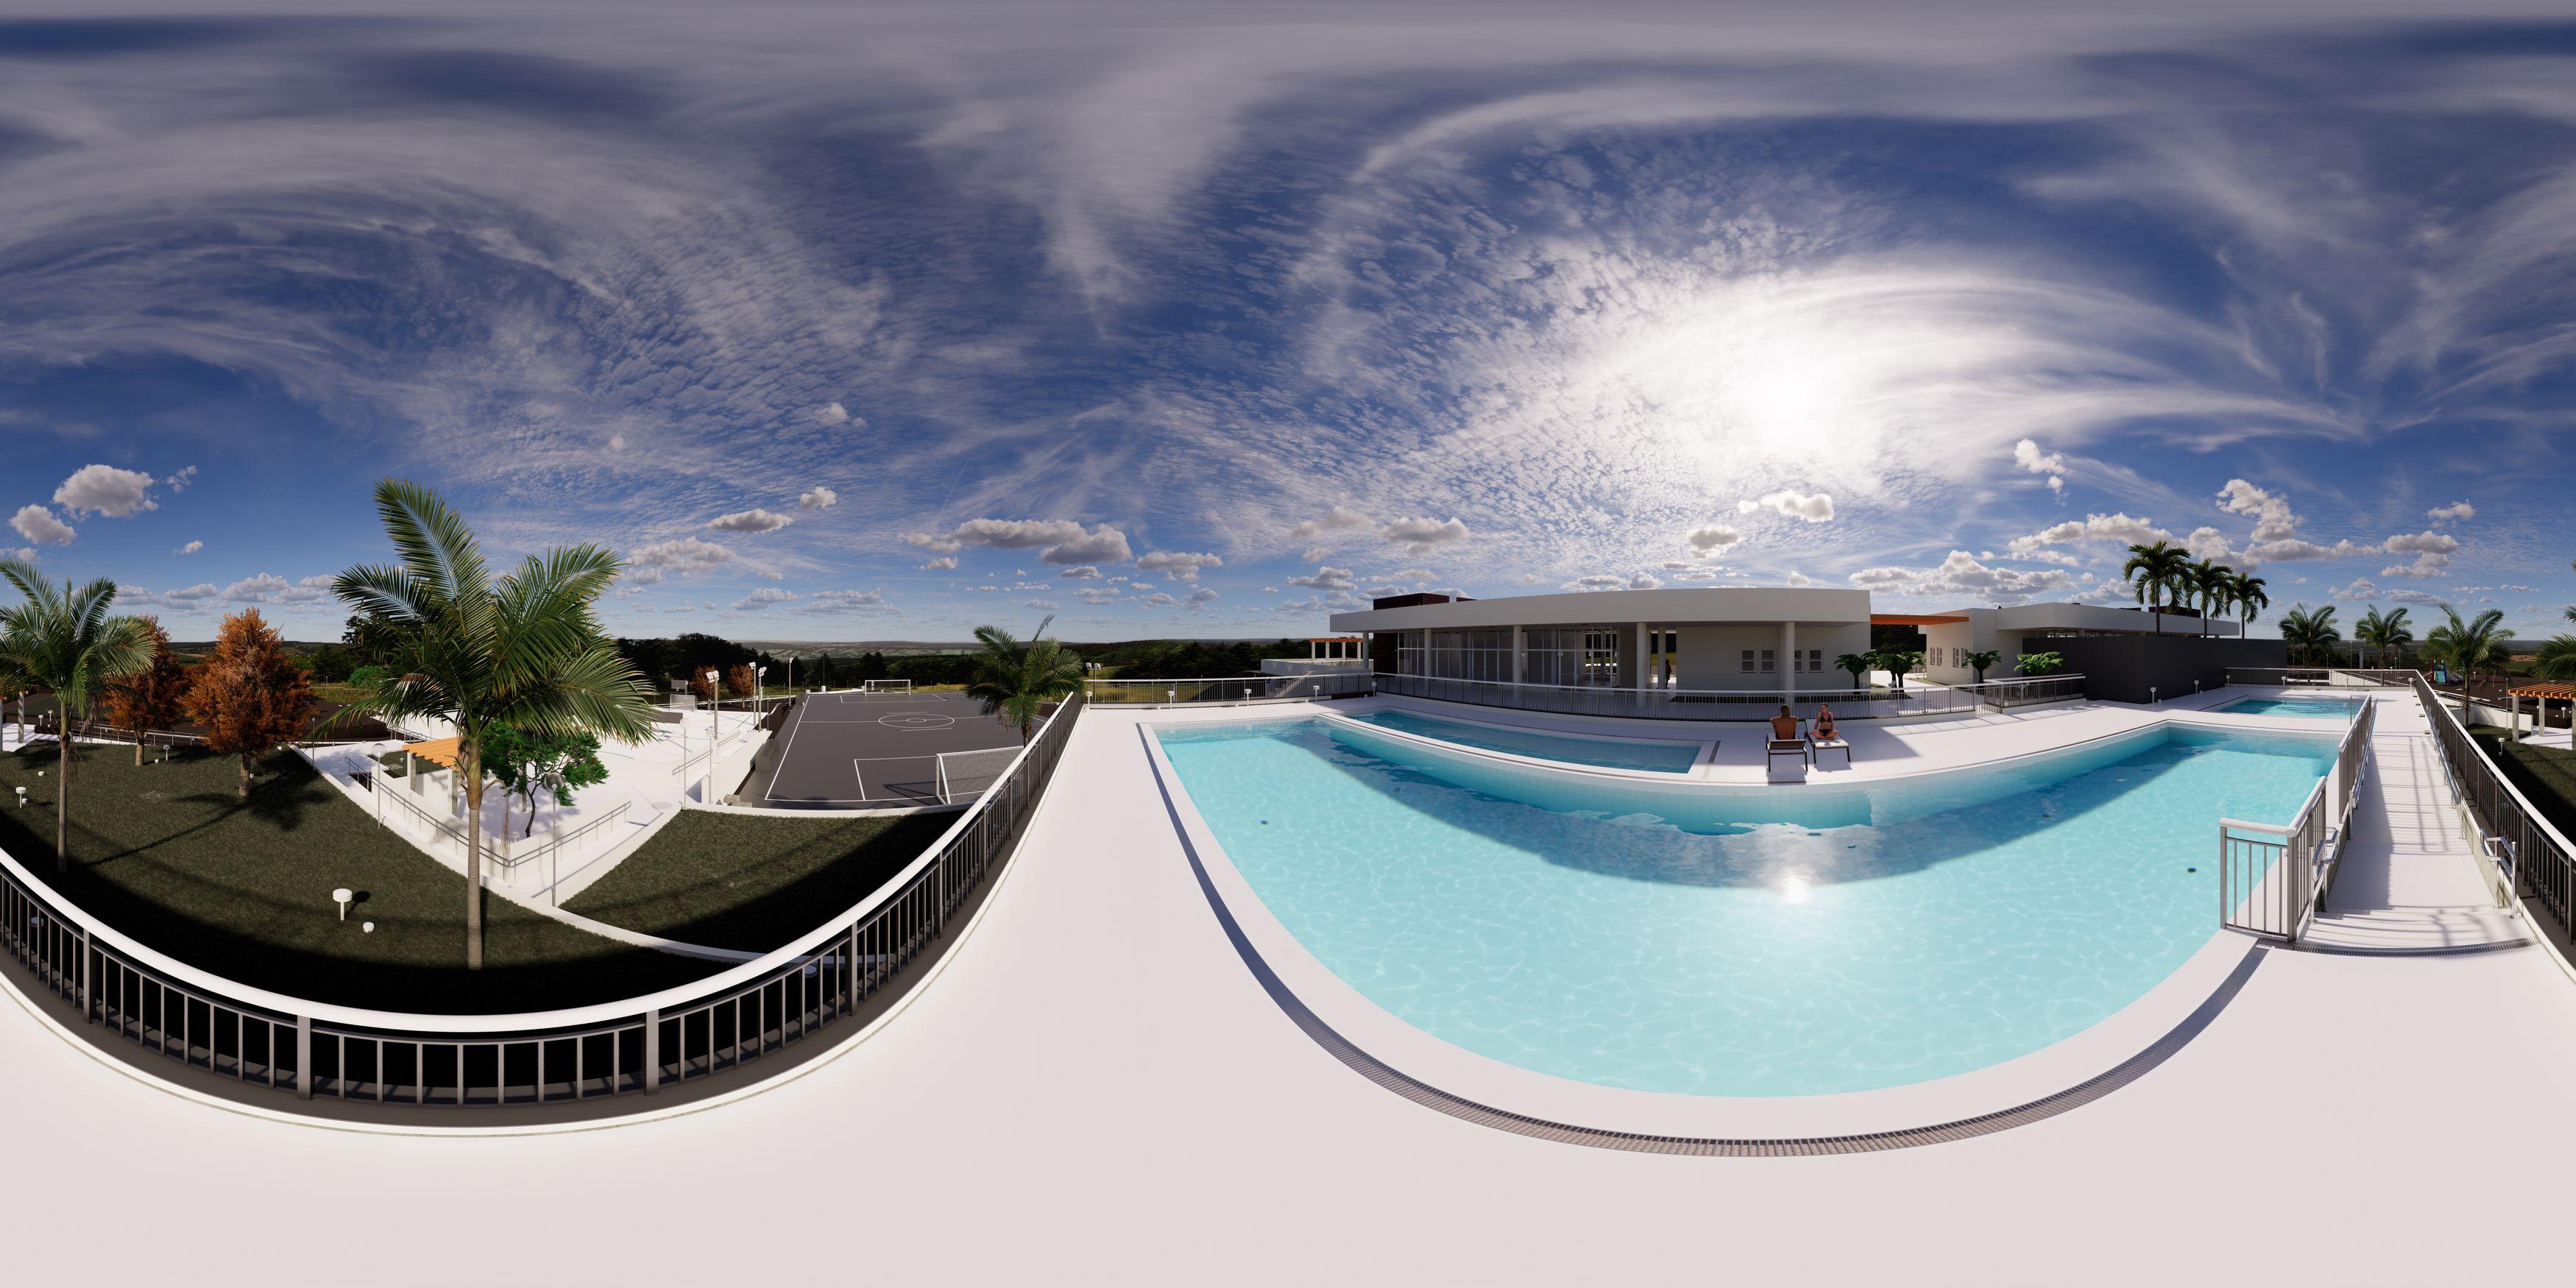 Panorama-703-mod-pe-coo-2020-05-14-11-17-04-3500-3500